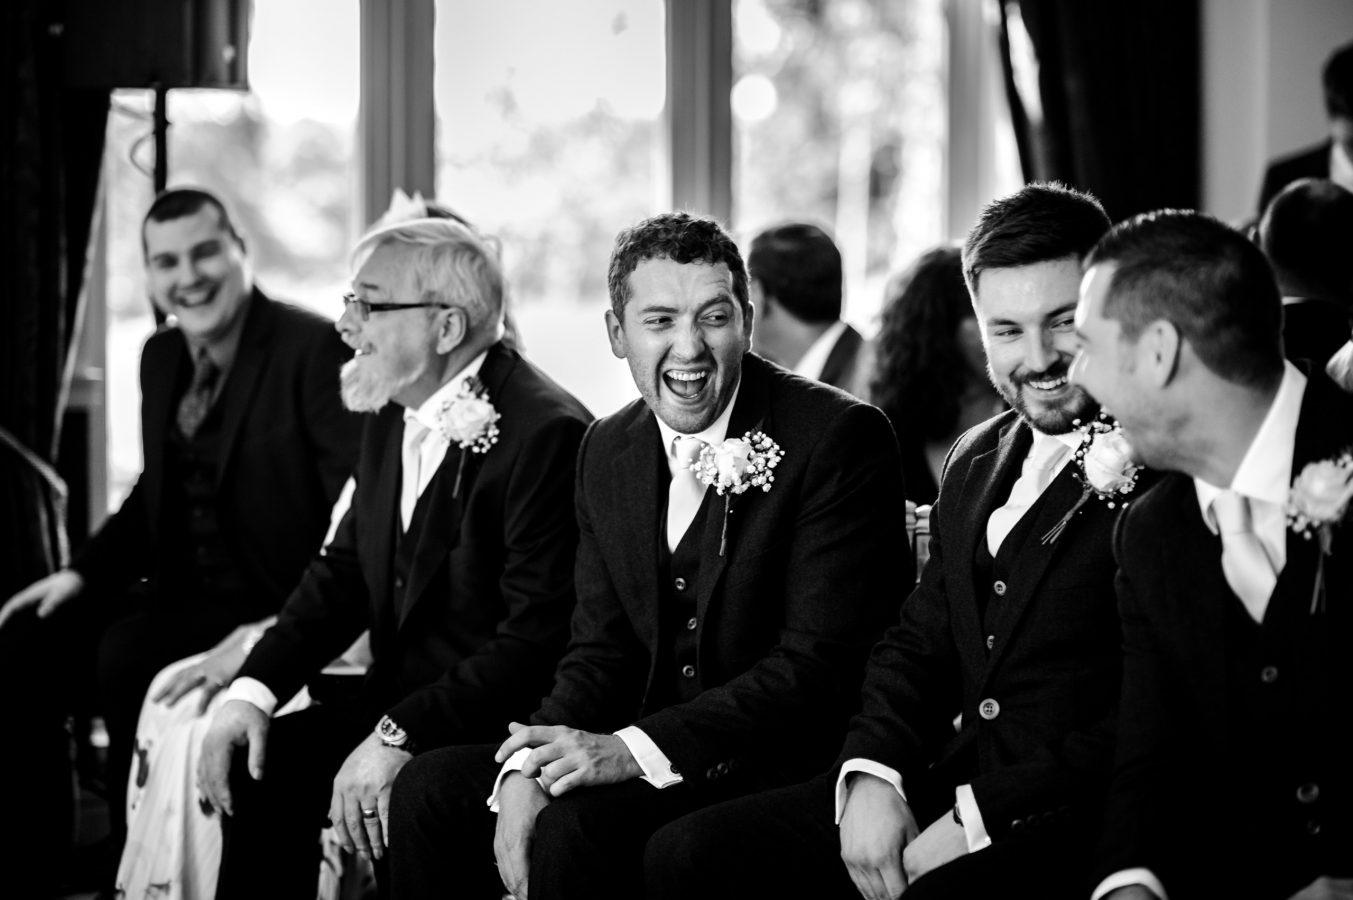 groomsmen-laughing-ceremony-dunkenhalgh-hotel